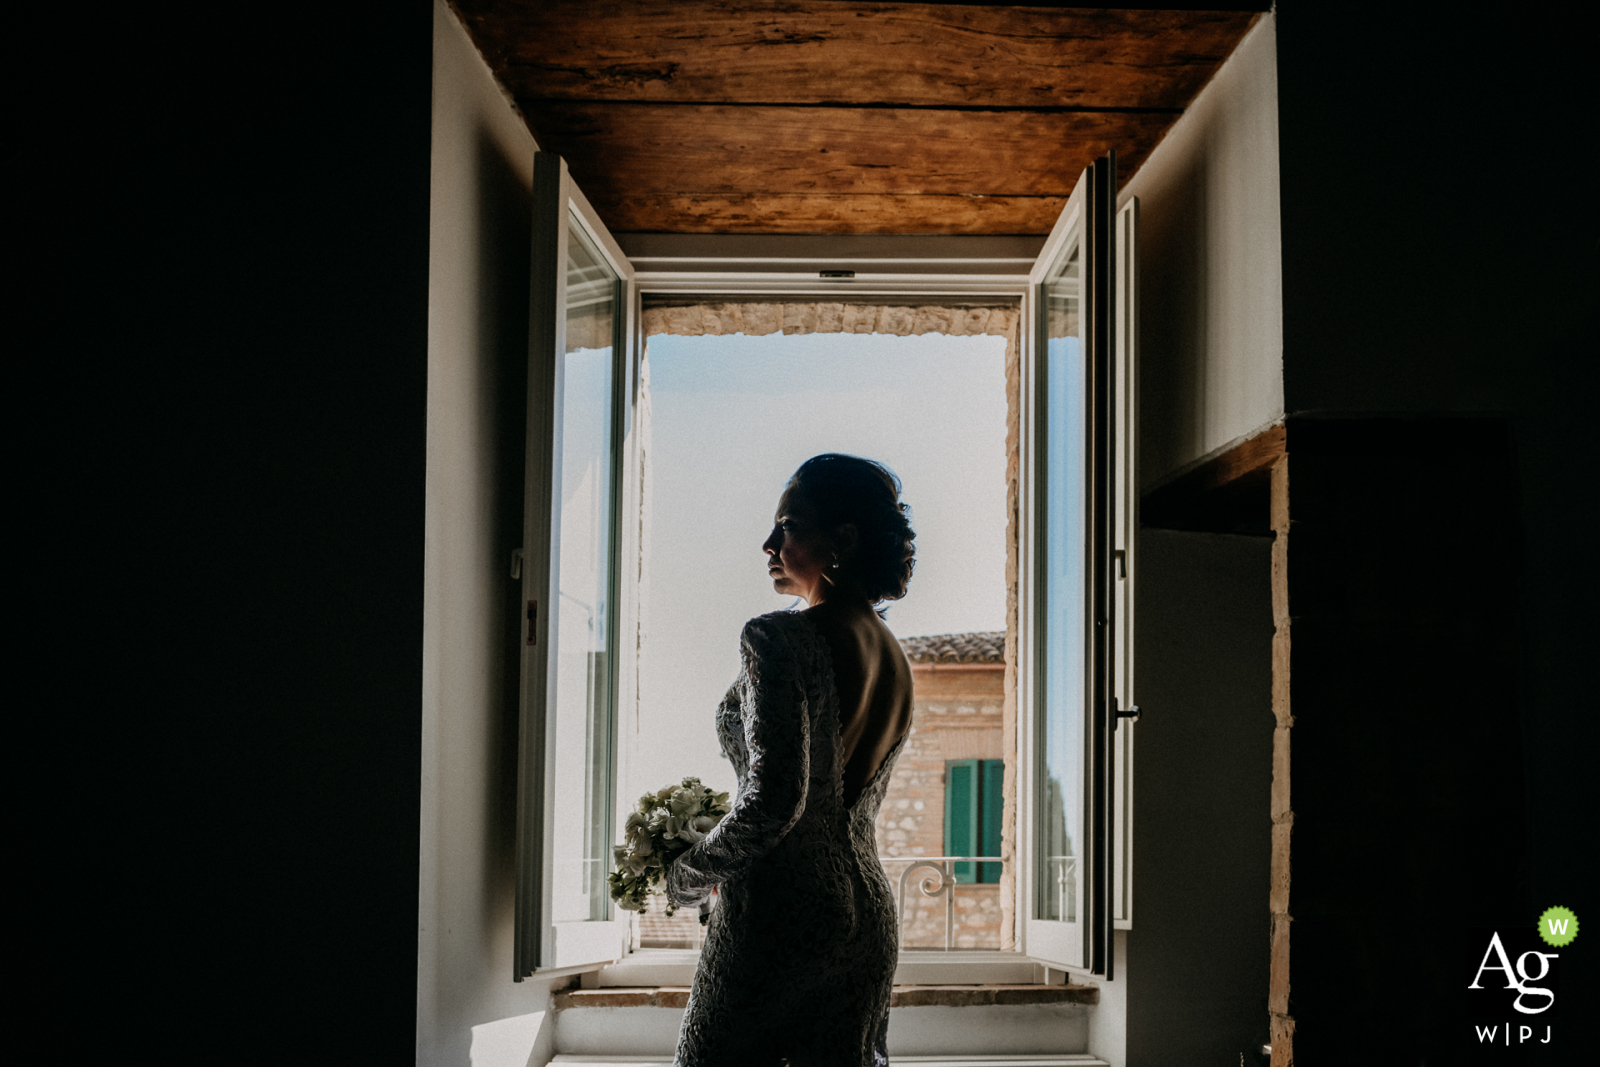 Giuseppe De Angelis is an artistic wedding photographer for Latina